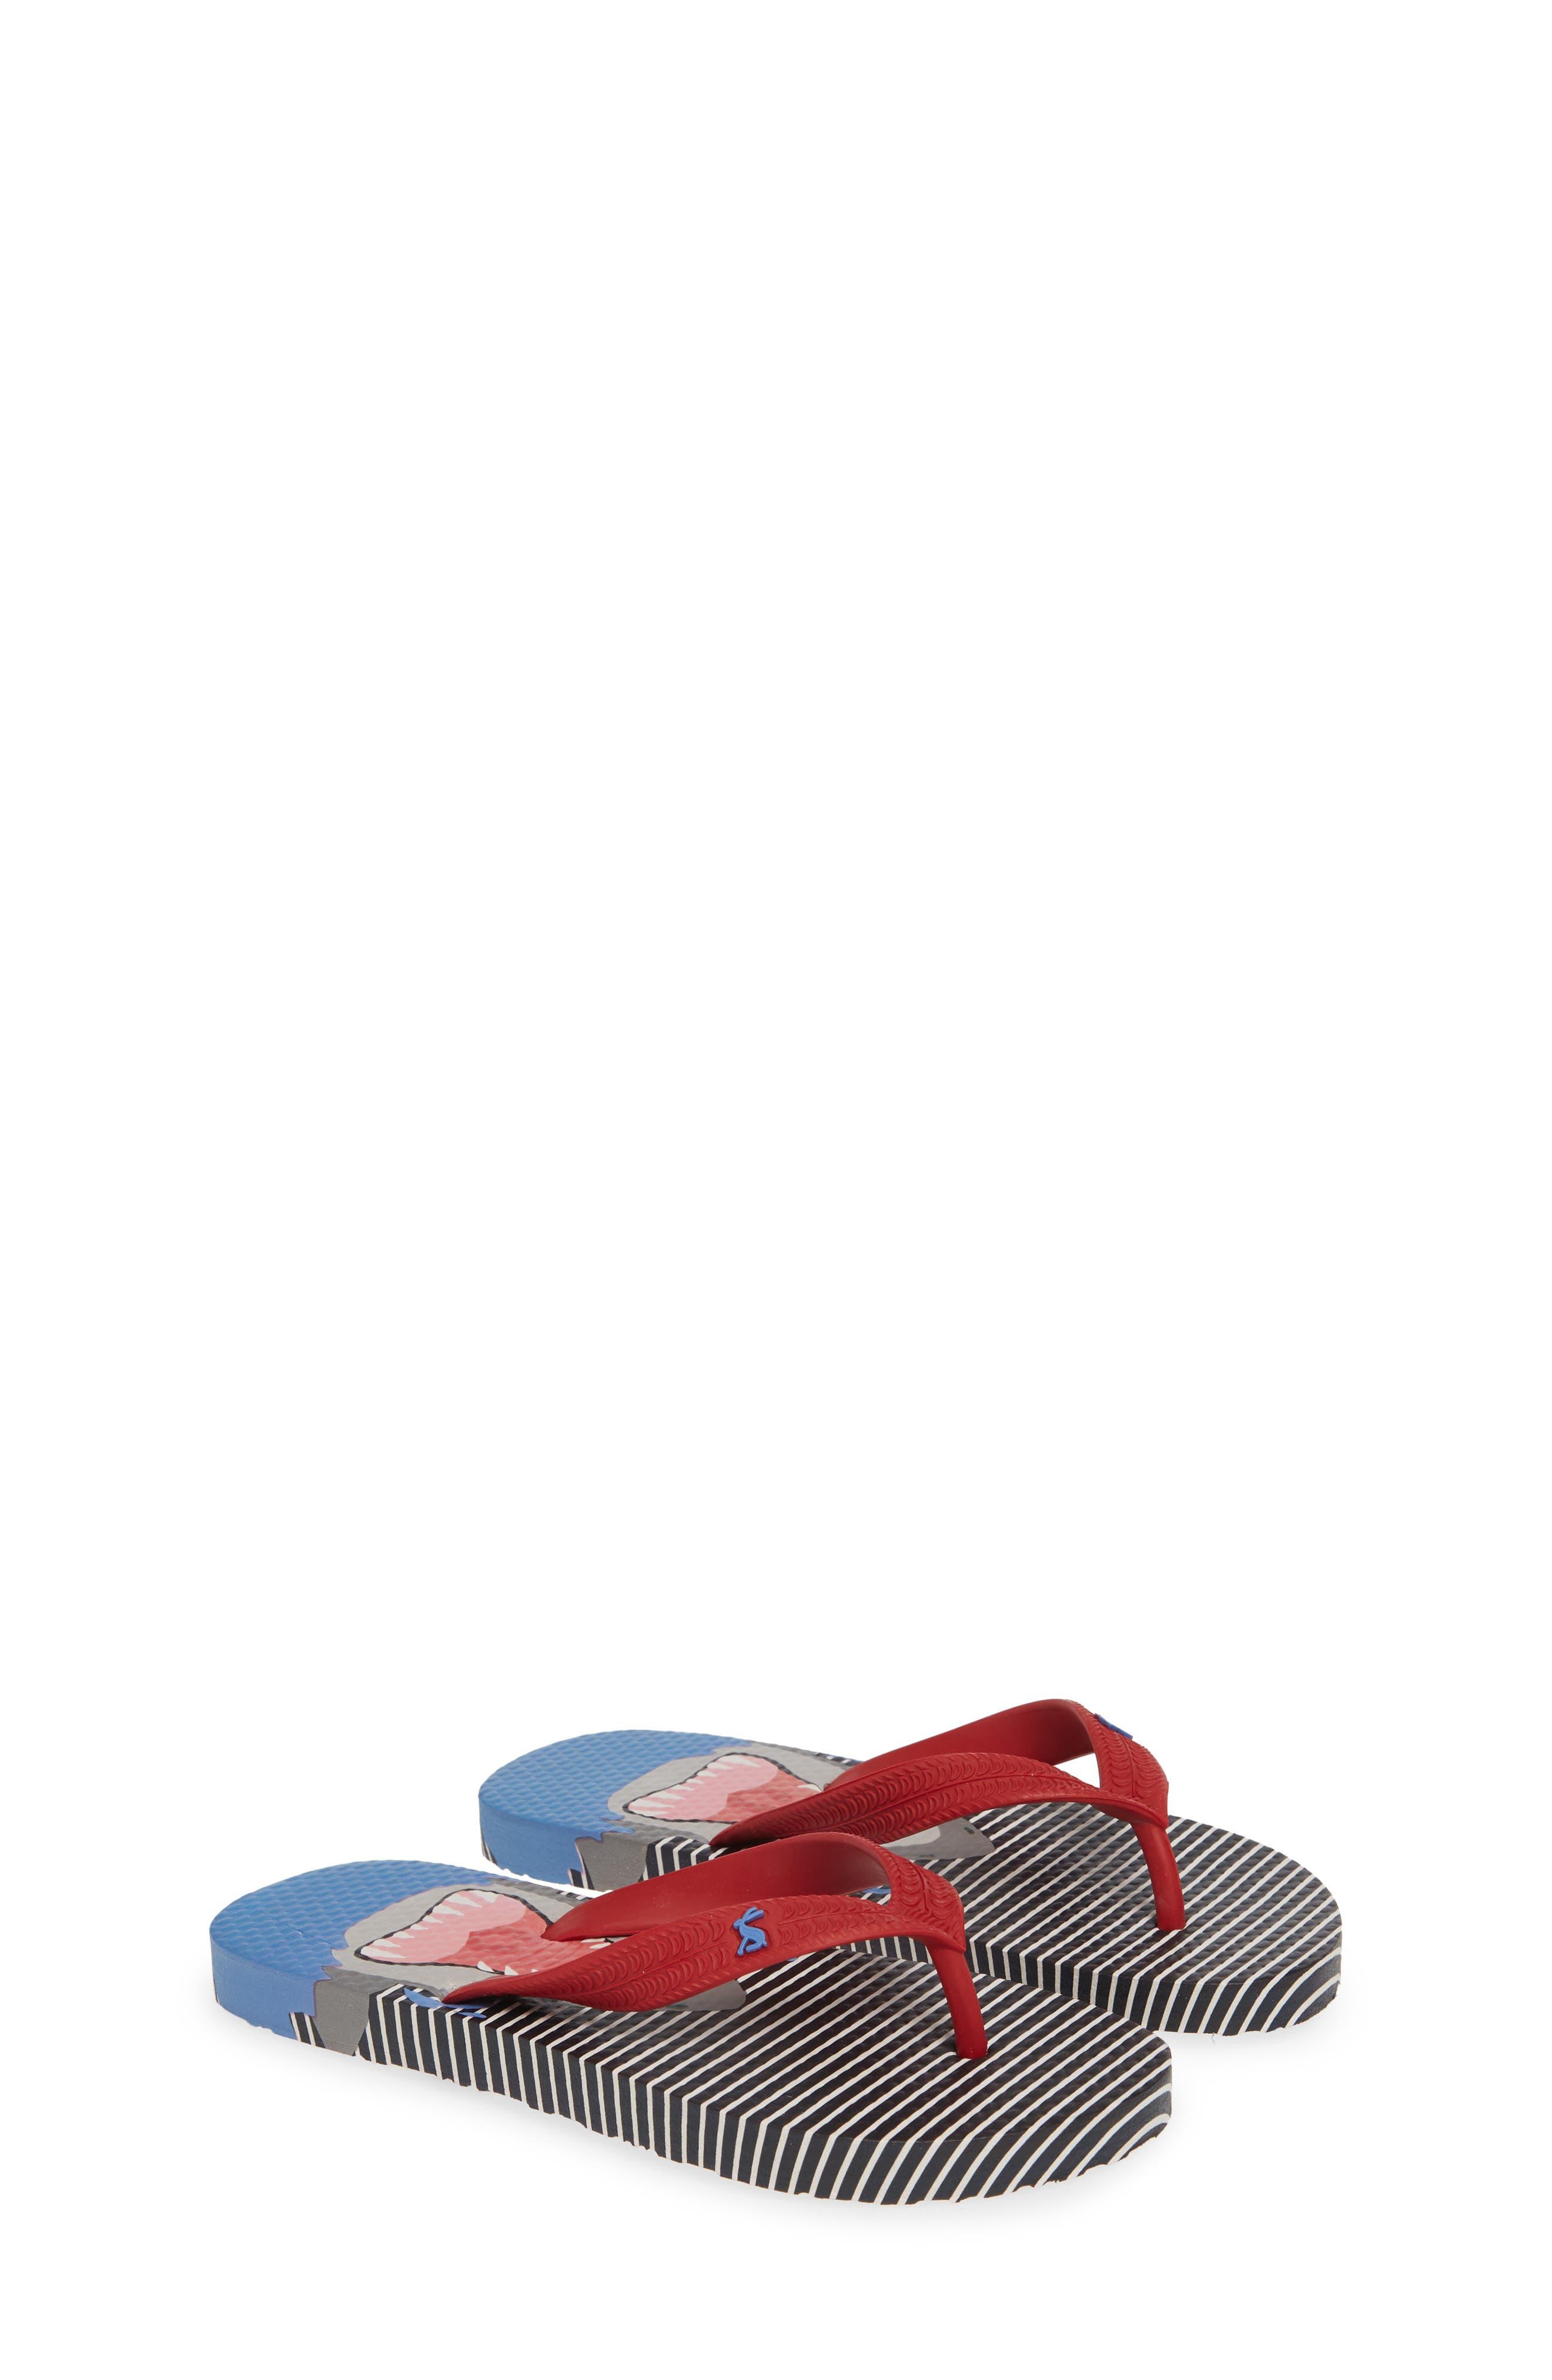 e46eb4347 Joules Flip-Flops   Sandals for Women